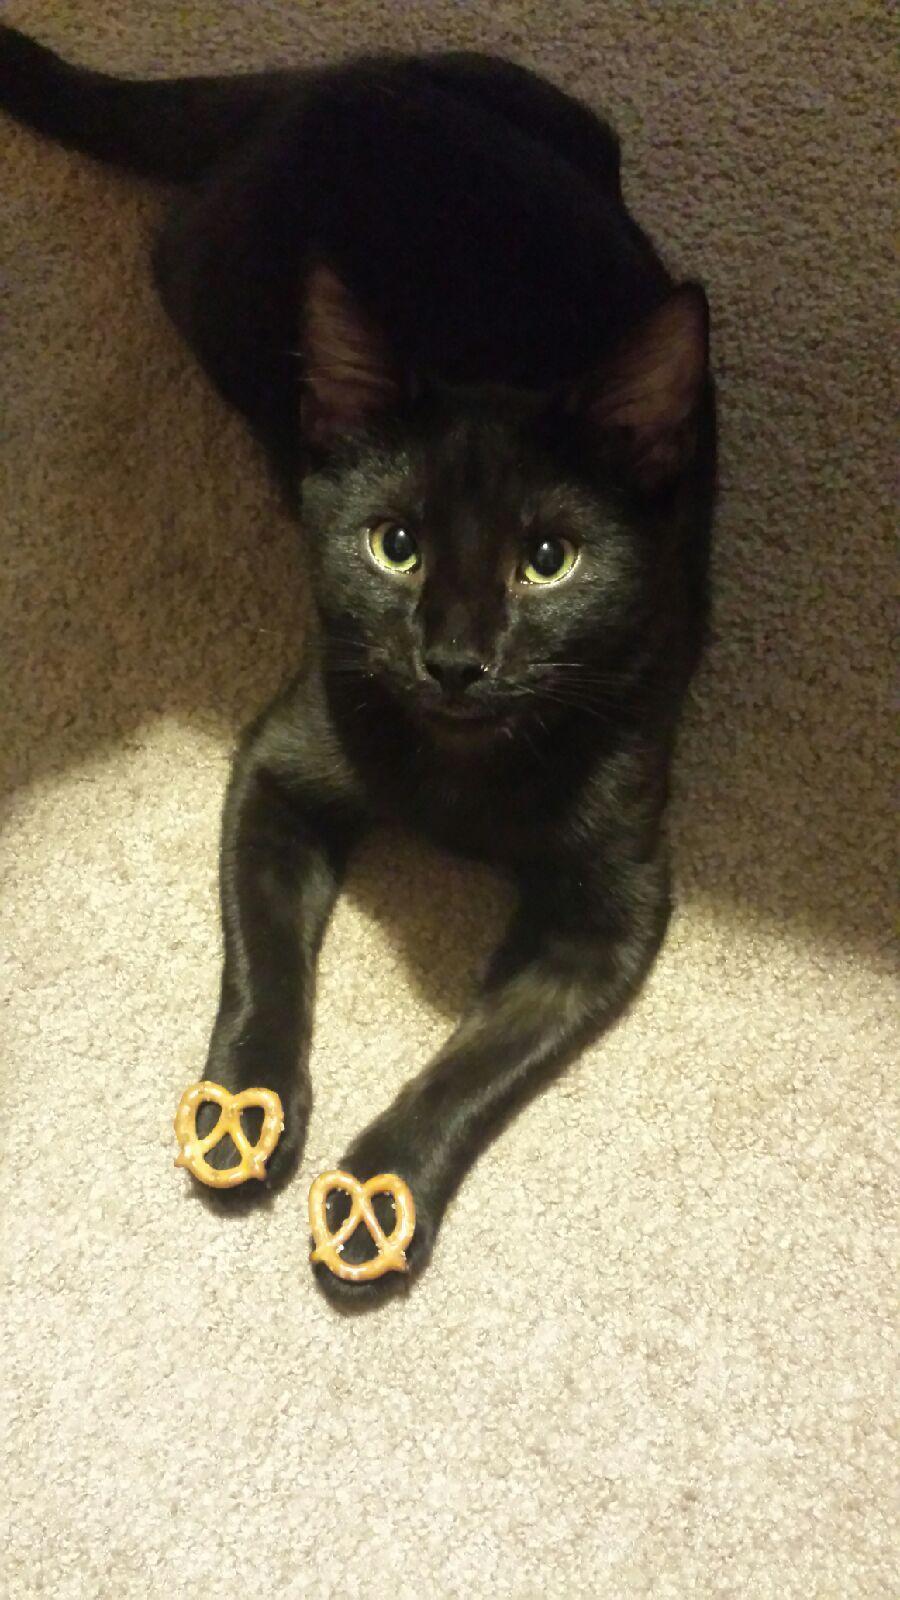 Goldfish? Would you like a pretzel instead? Black cat